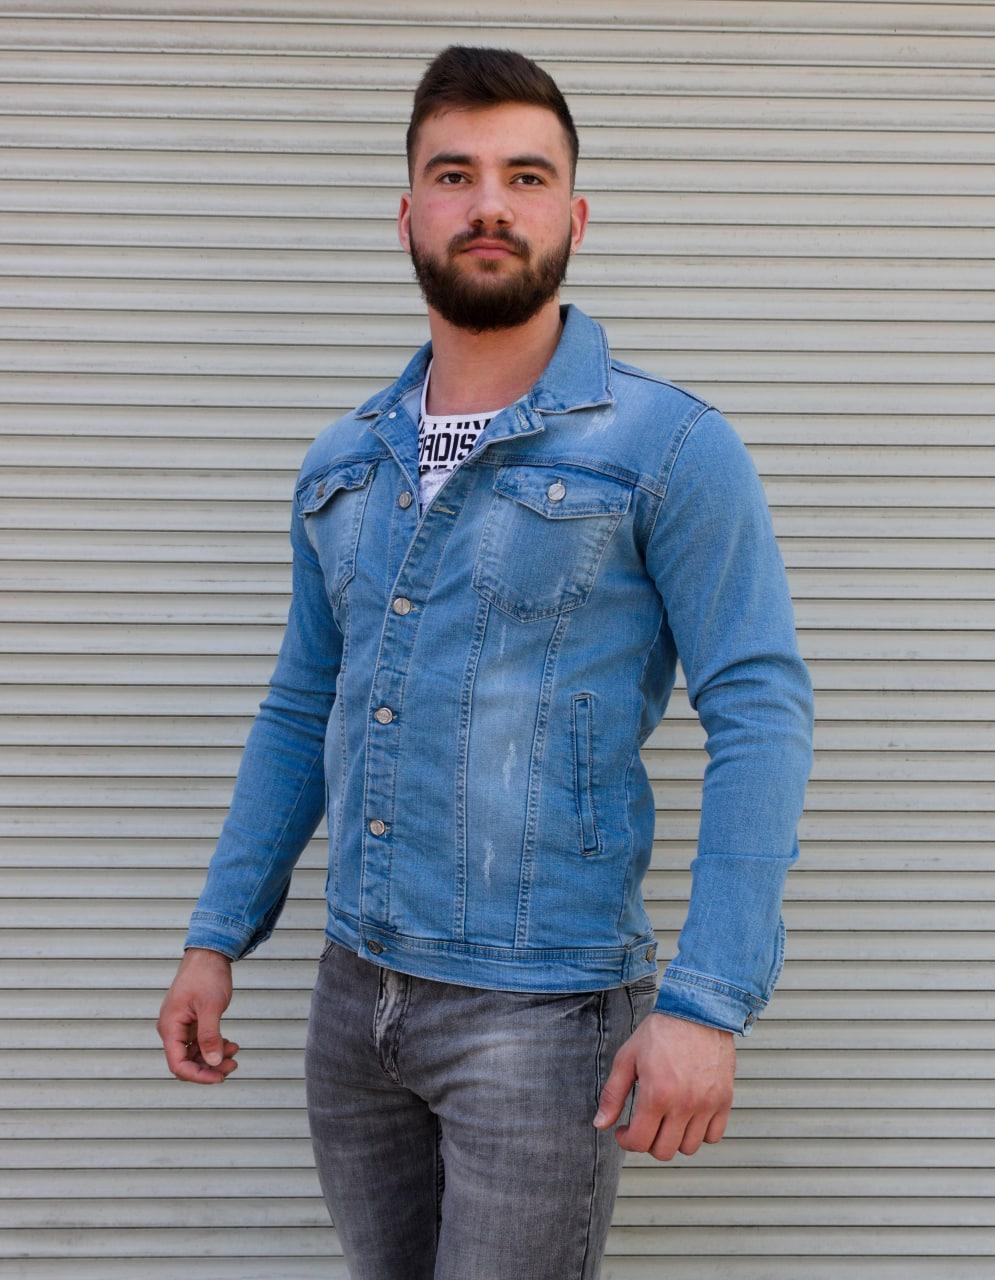 Блакитна джинсова куртка на гудзиках | Туреччина | 100% бавовна